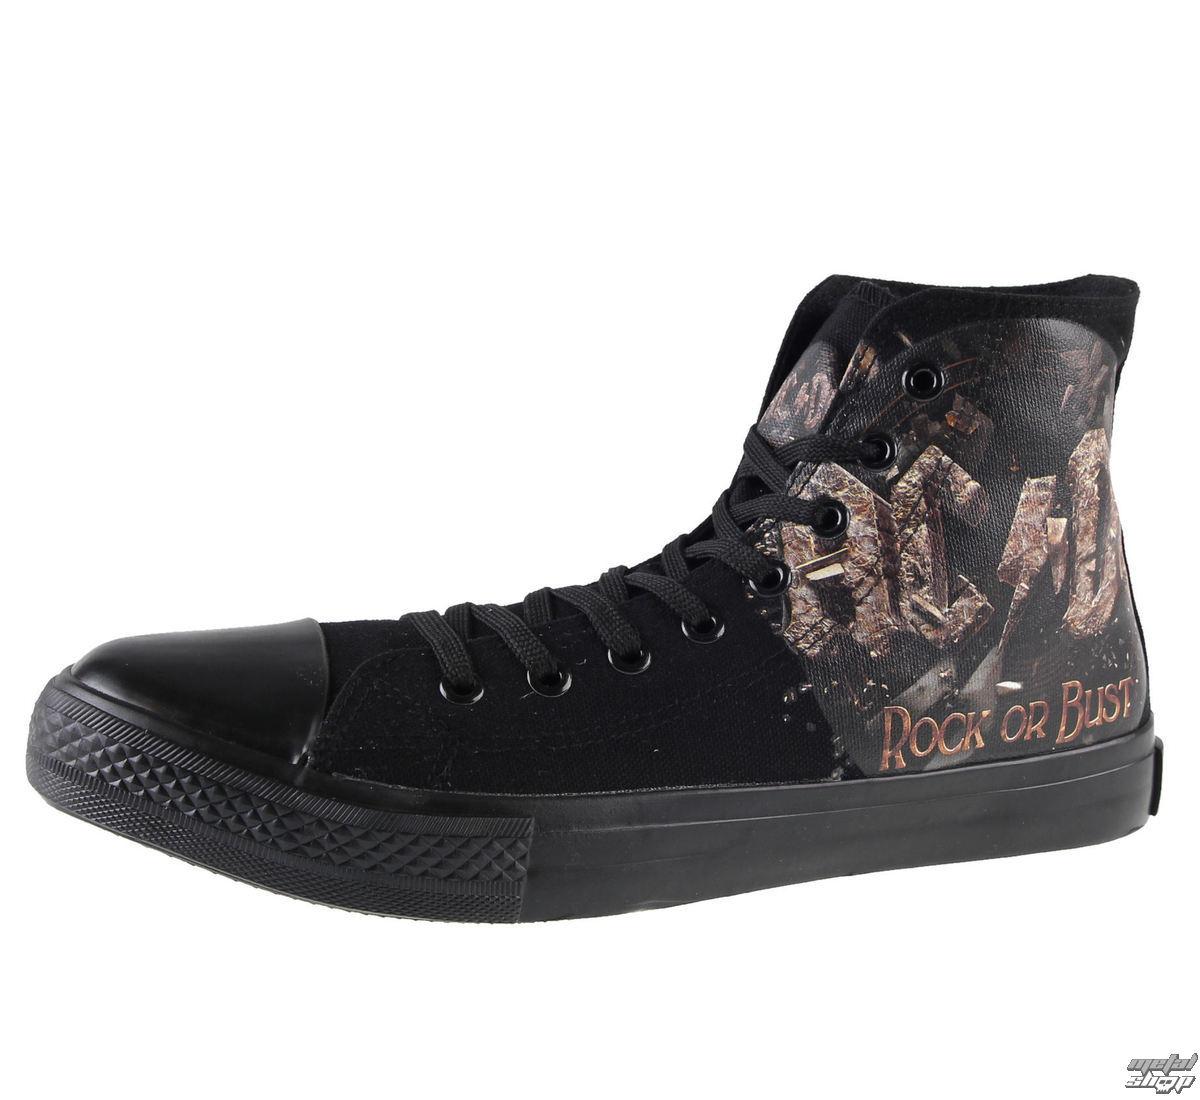 magasszárú cipő női AC-DC - F.B.I. - 4510242 - Metalshop.hu 3f879bc7d8